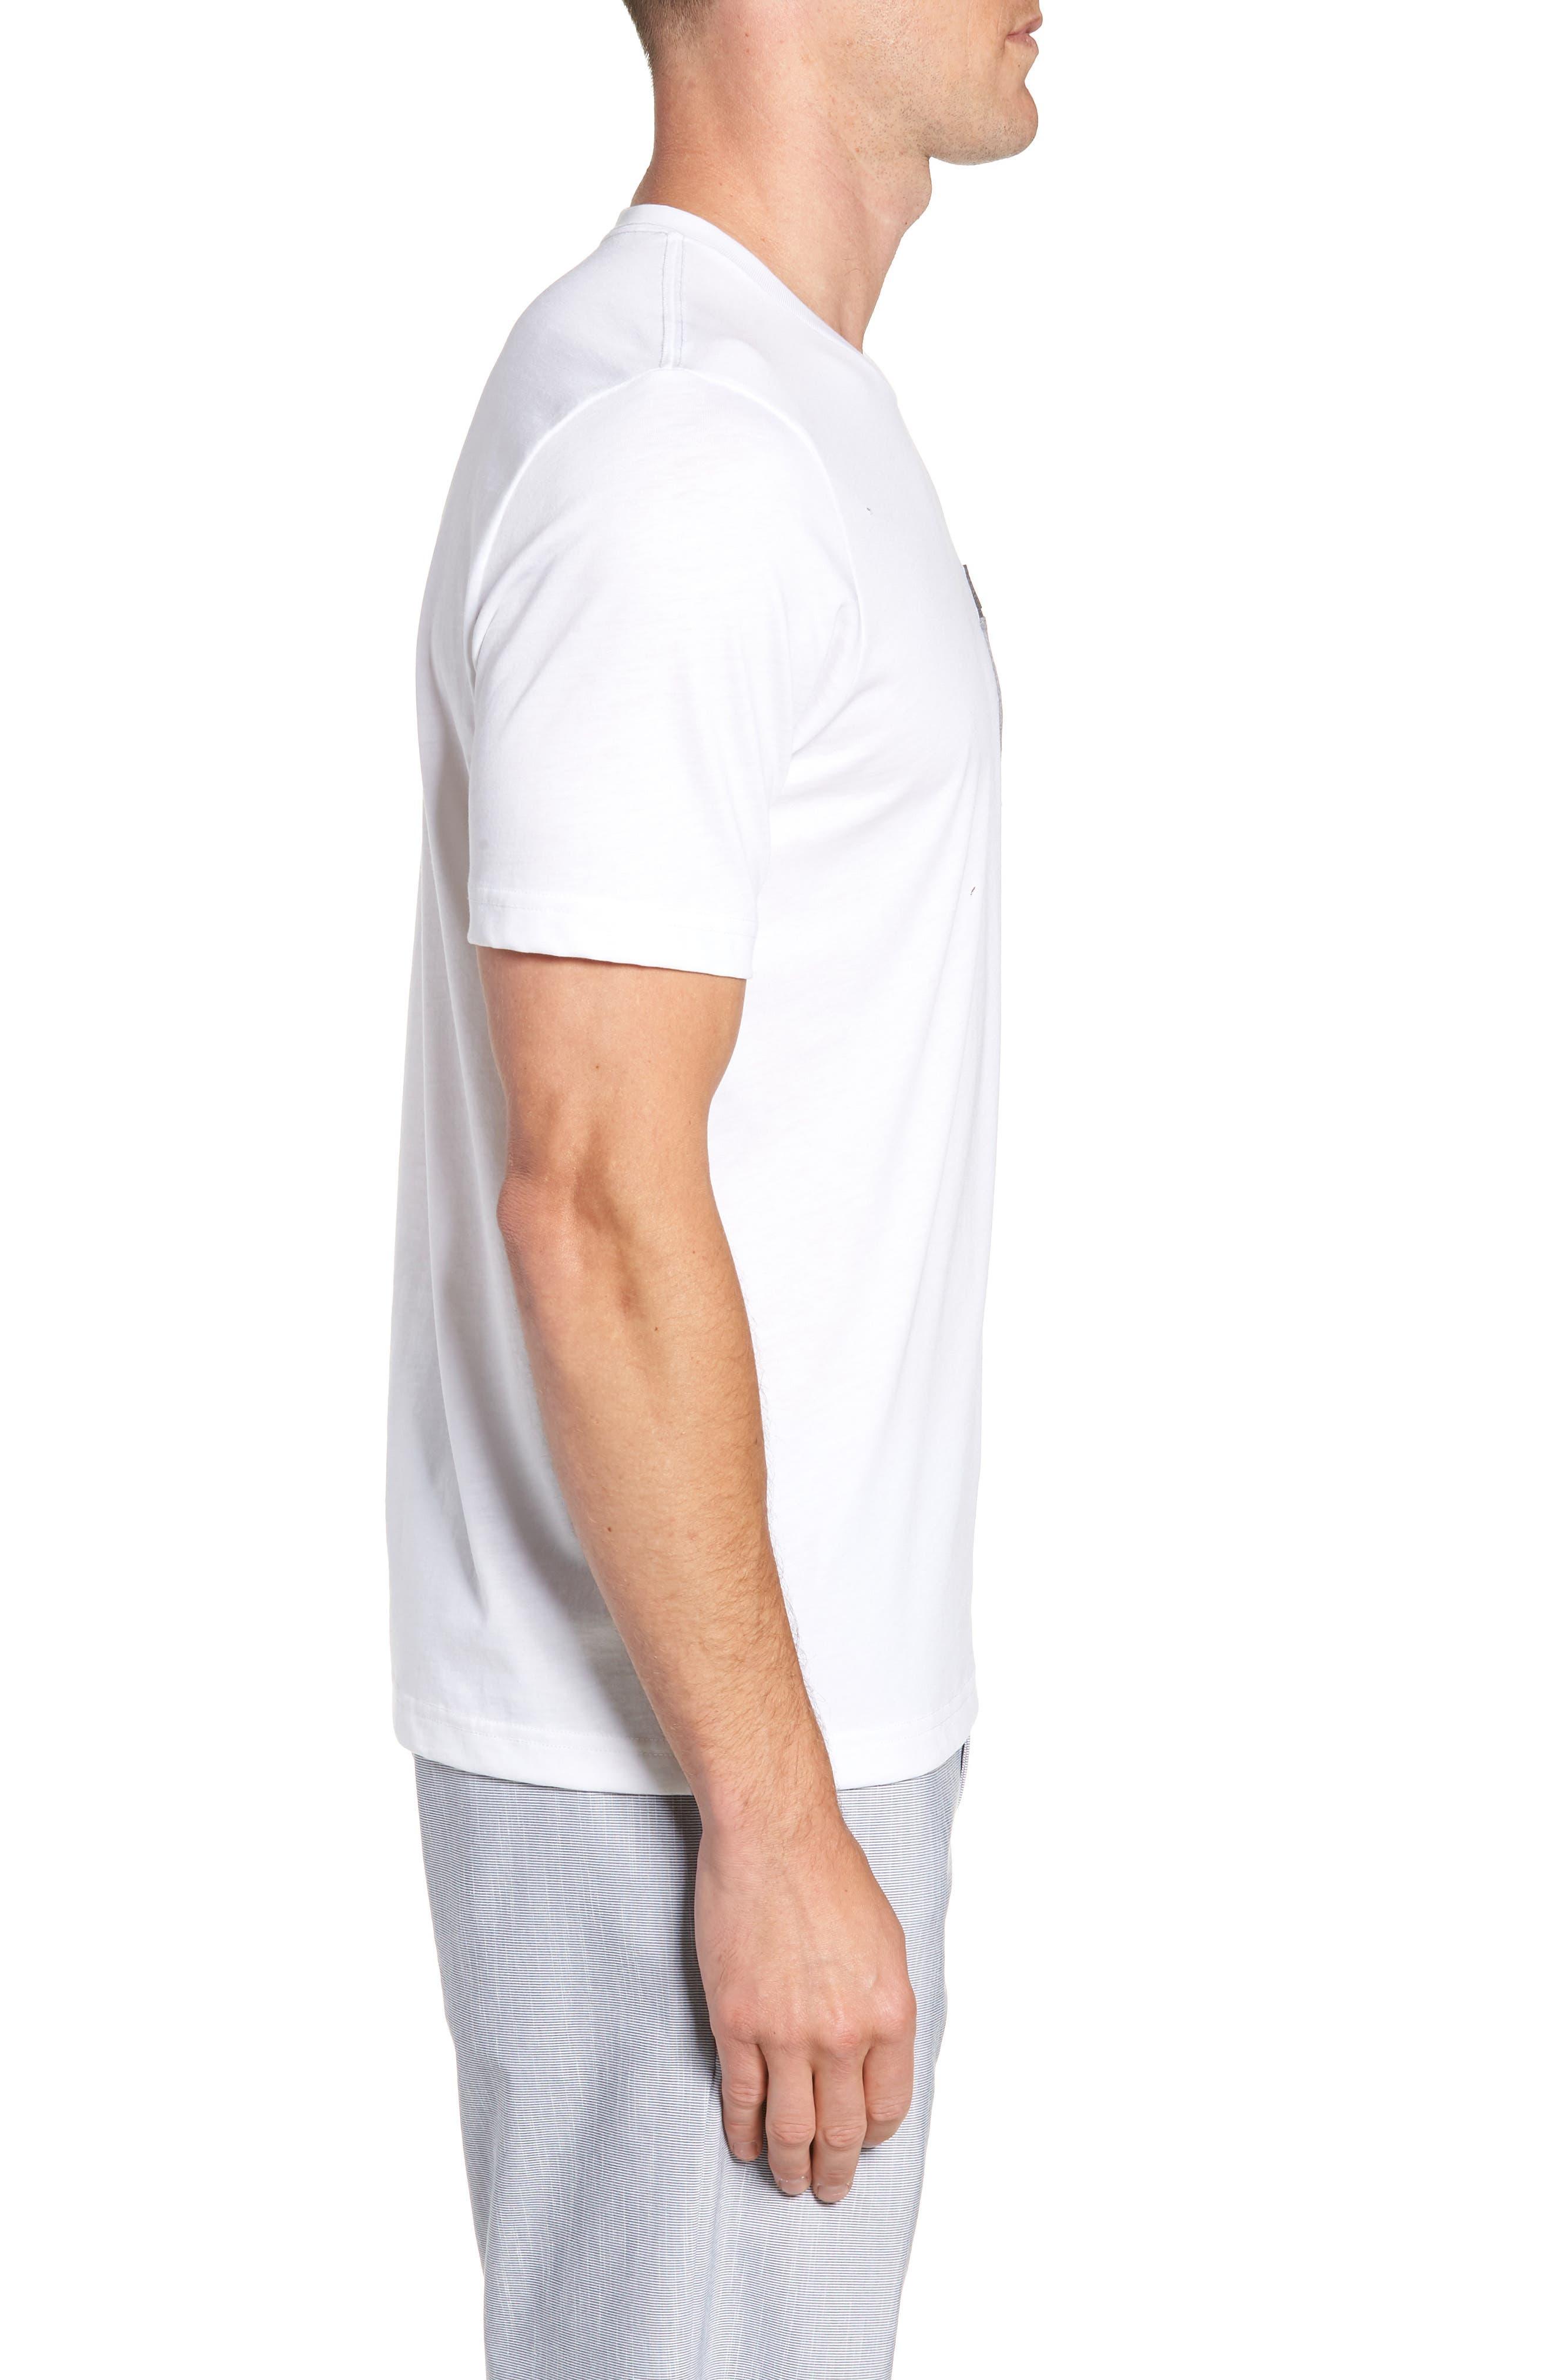 Muska Pocket T-Shirt,                             Alternate thumbnail 3, color,                             100